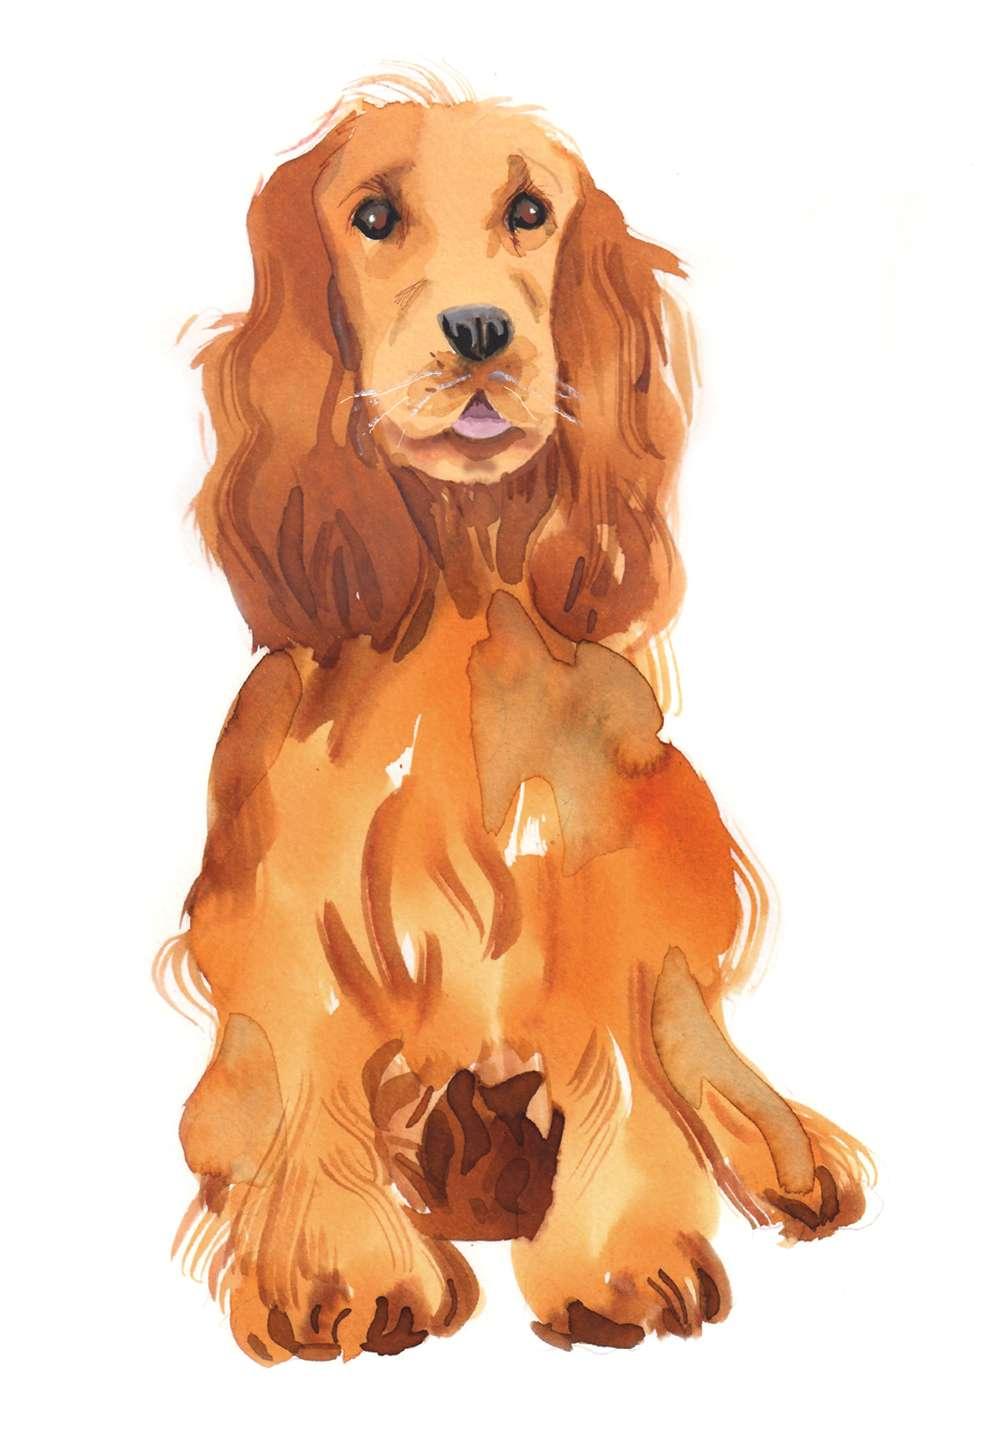 Lesley Buckingham, Handpainted dog